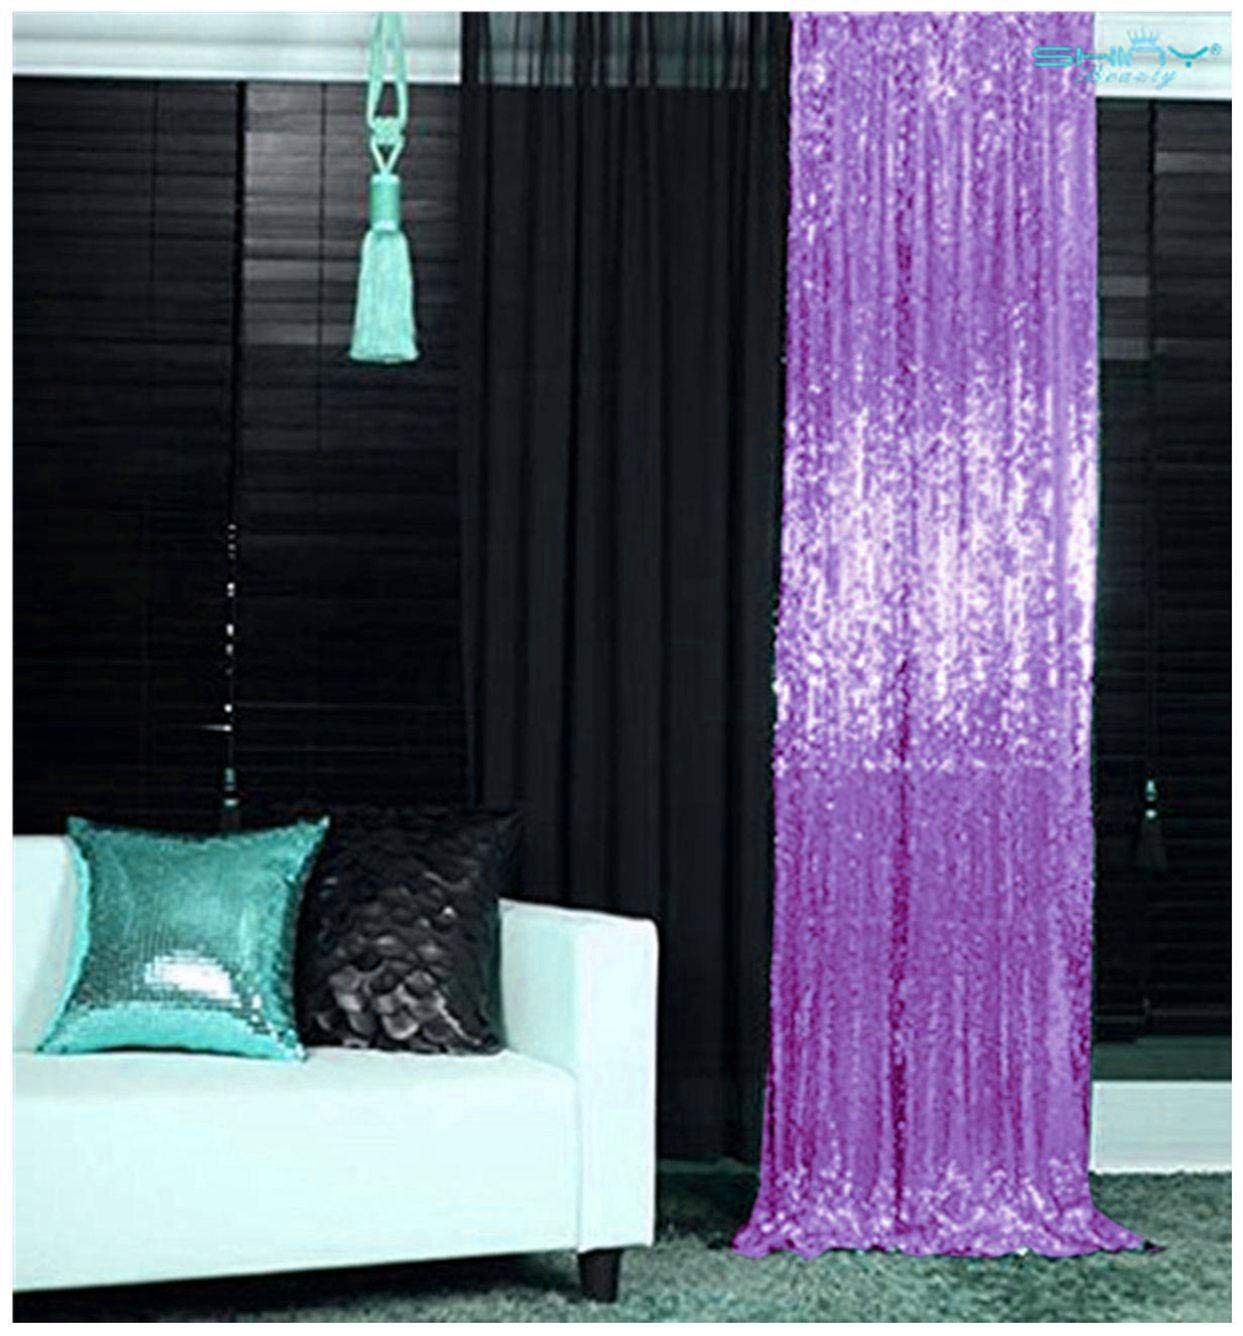 ShinyBeauty Lavender Sequin Backdrop 2 Panels 3 FT x 11 FT Glitter Backdrop for Girls Sequin Curtains Party Baby Shower Backdrop~N0329 by ShinyBeauty